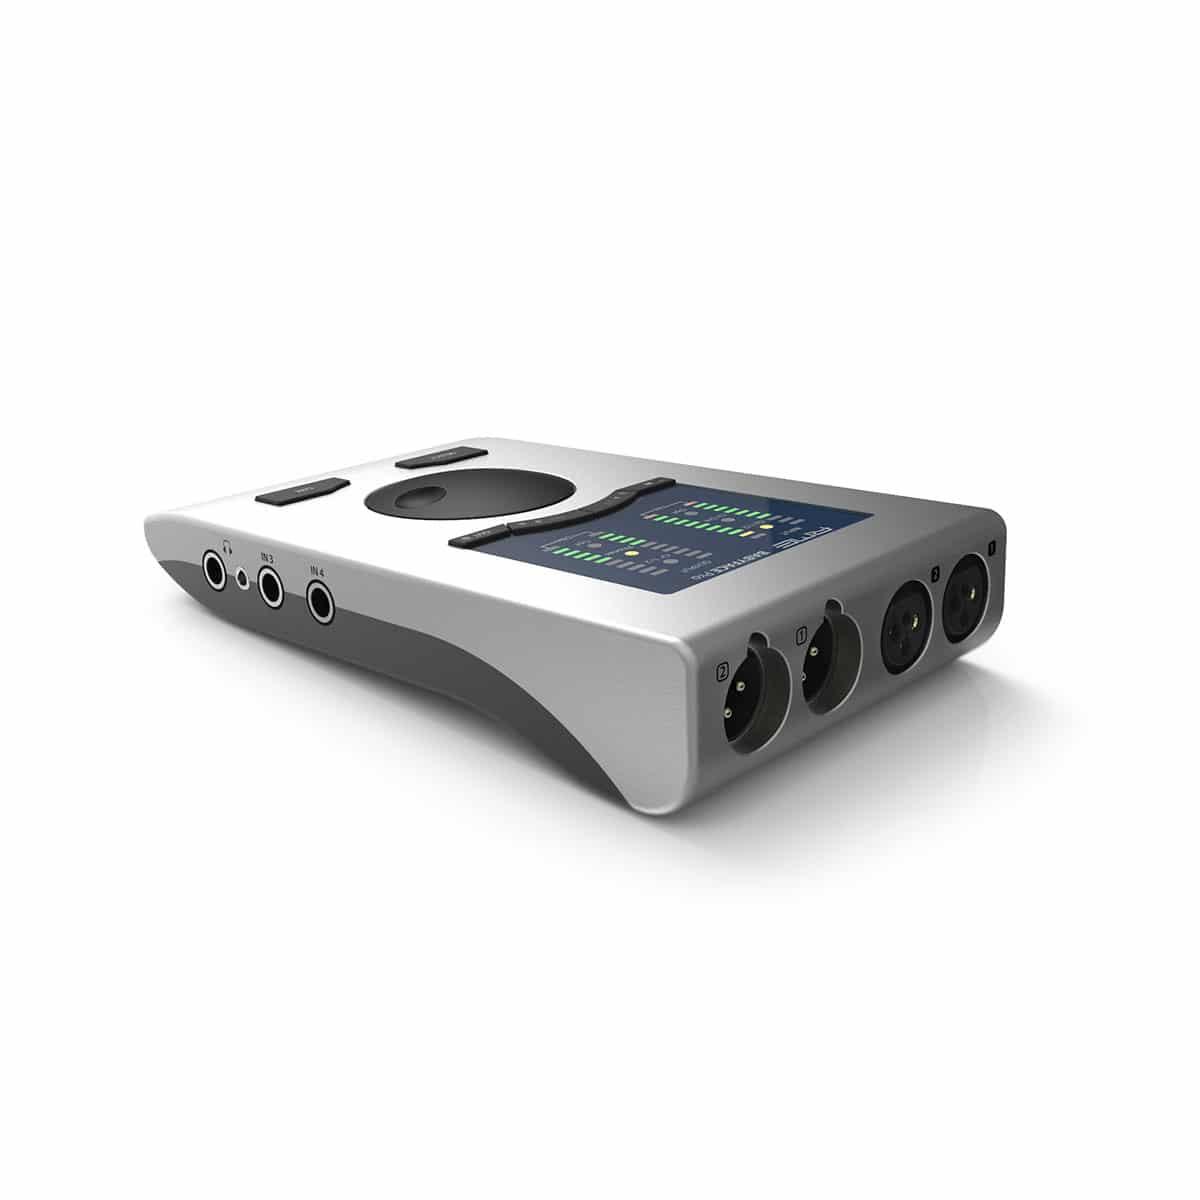 RME Babyface Pro 02 Pro Audio, Audio Digitale, Schede Audio per PC e MAC